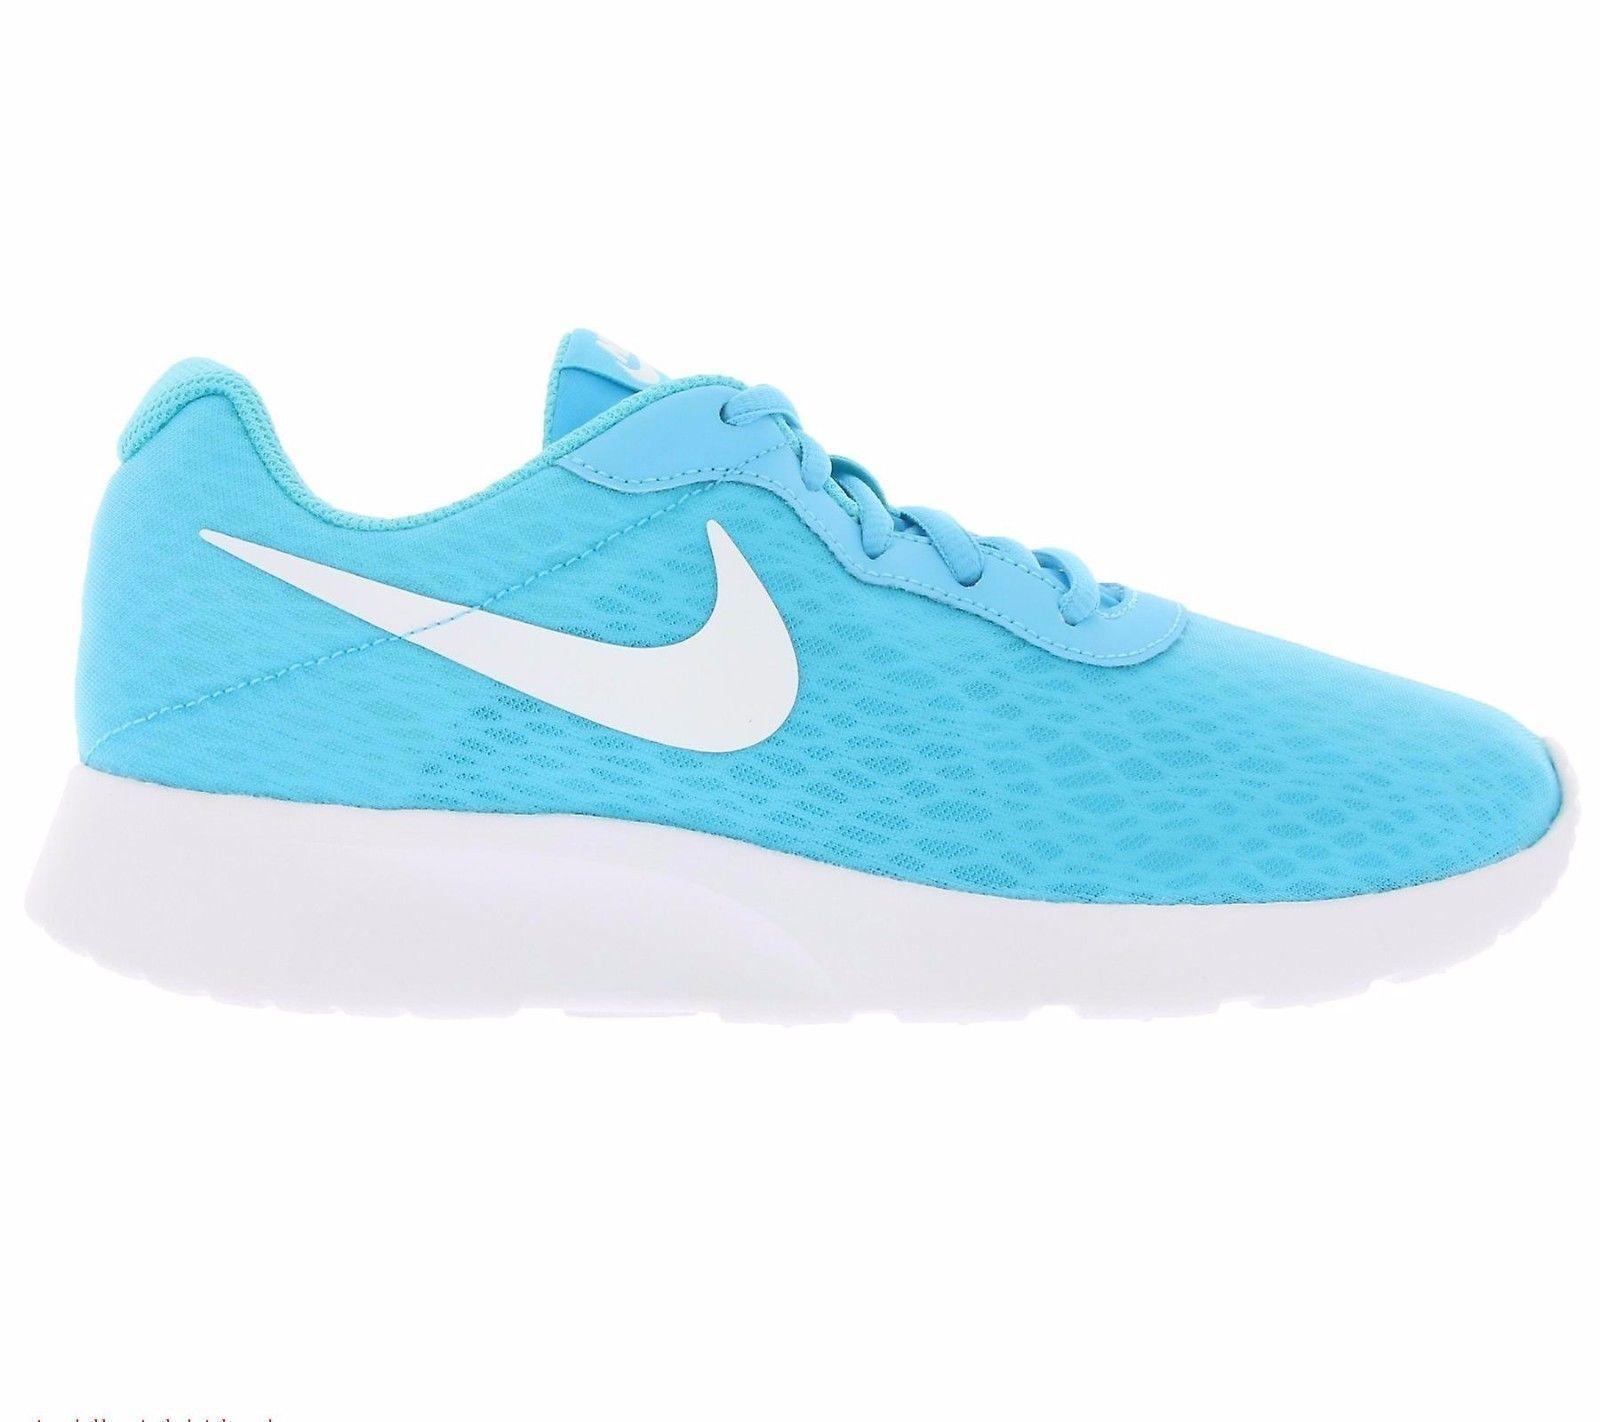 Nike WMNS Tanjun BR Damen Sportschuhe Turnschuhe 833677-410